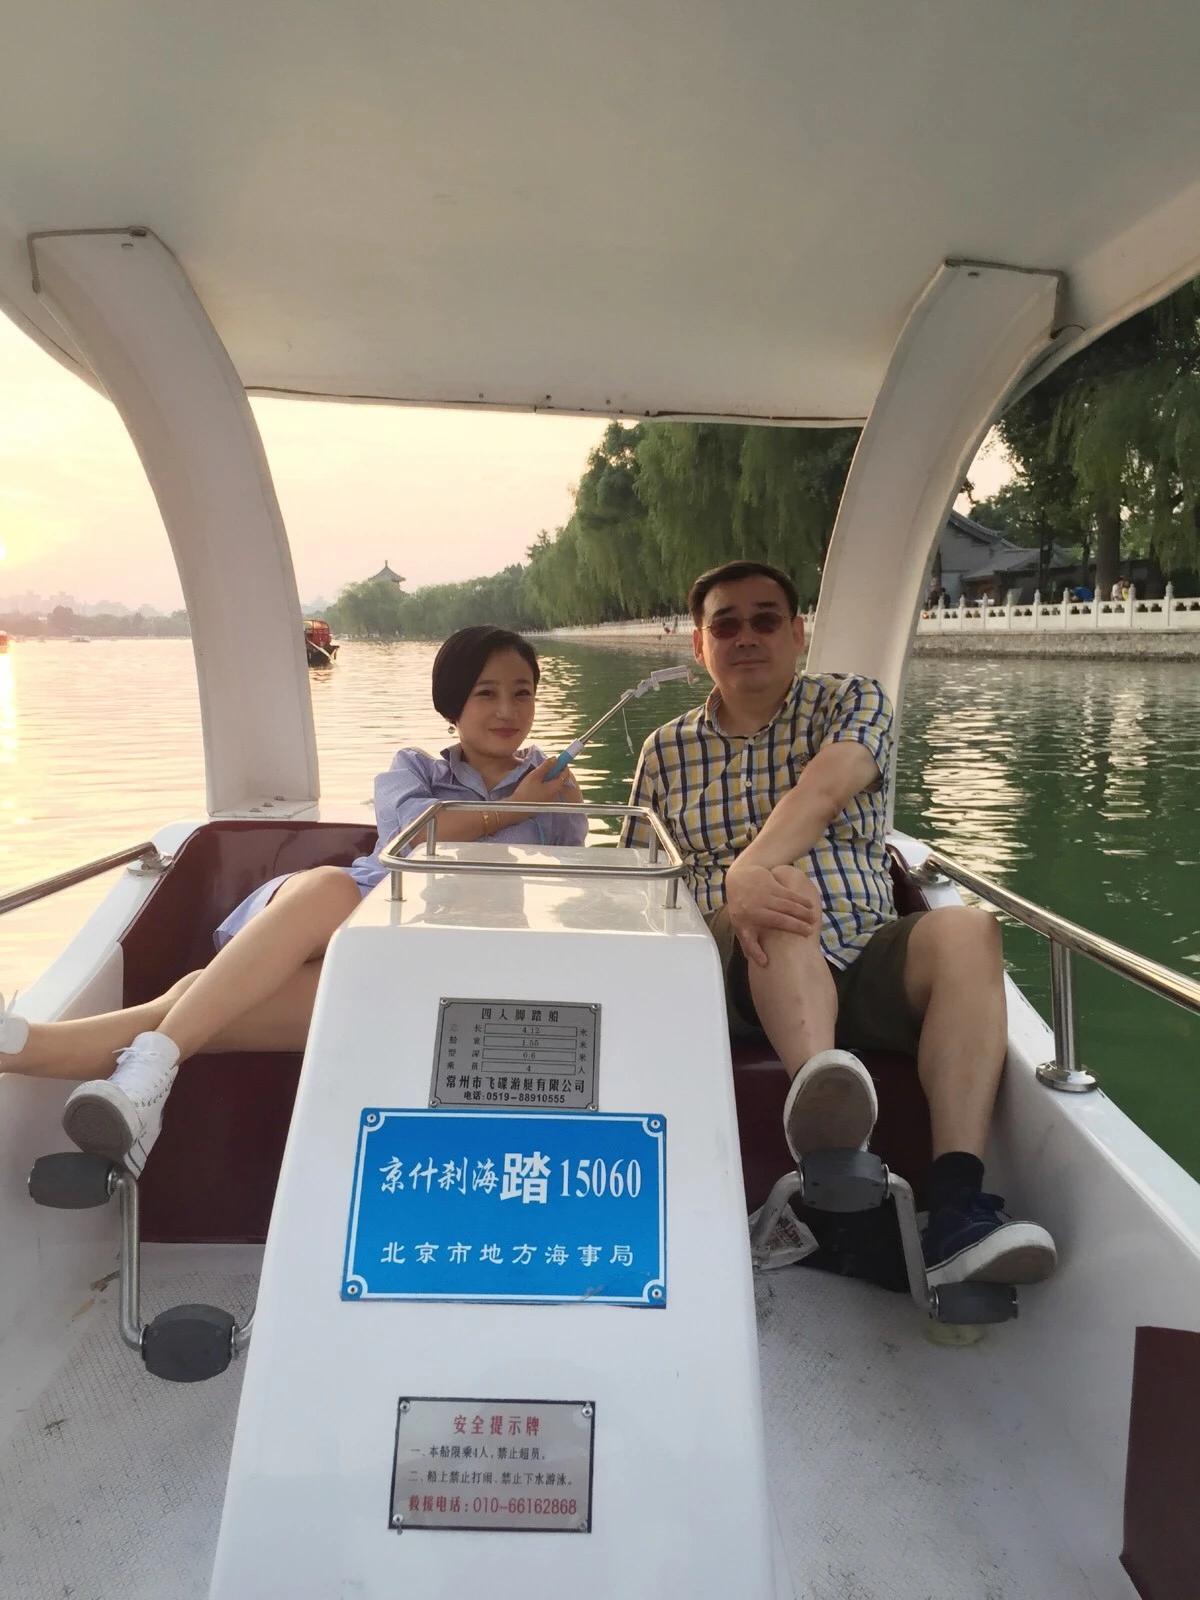 Mr Yang and his wife. Chongyi Feng